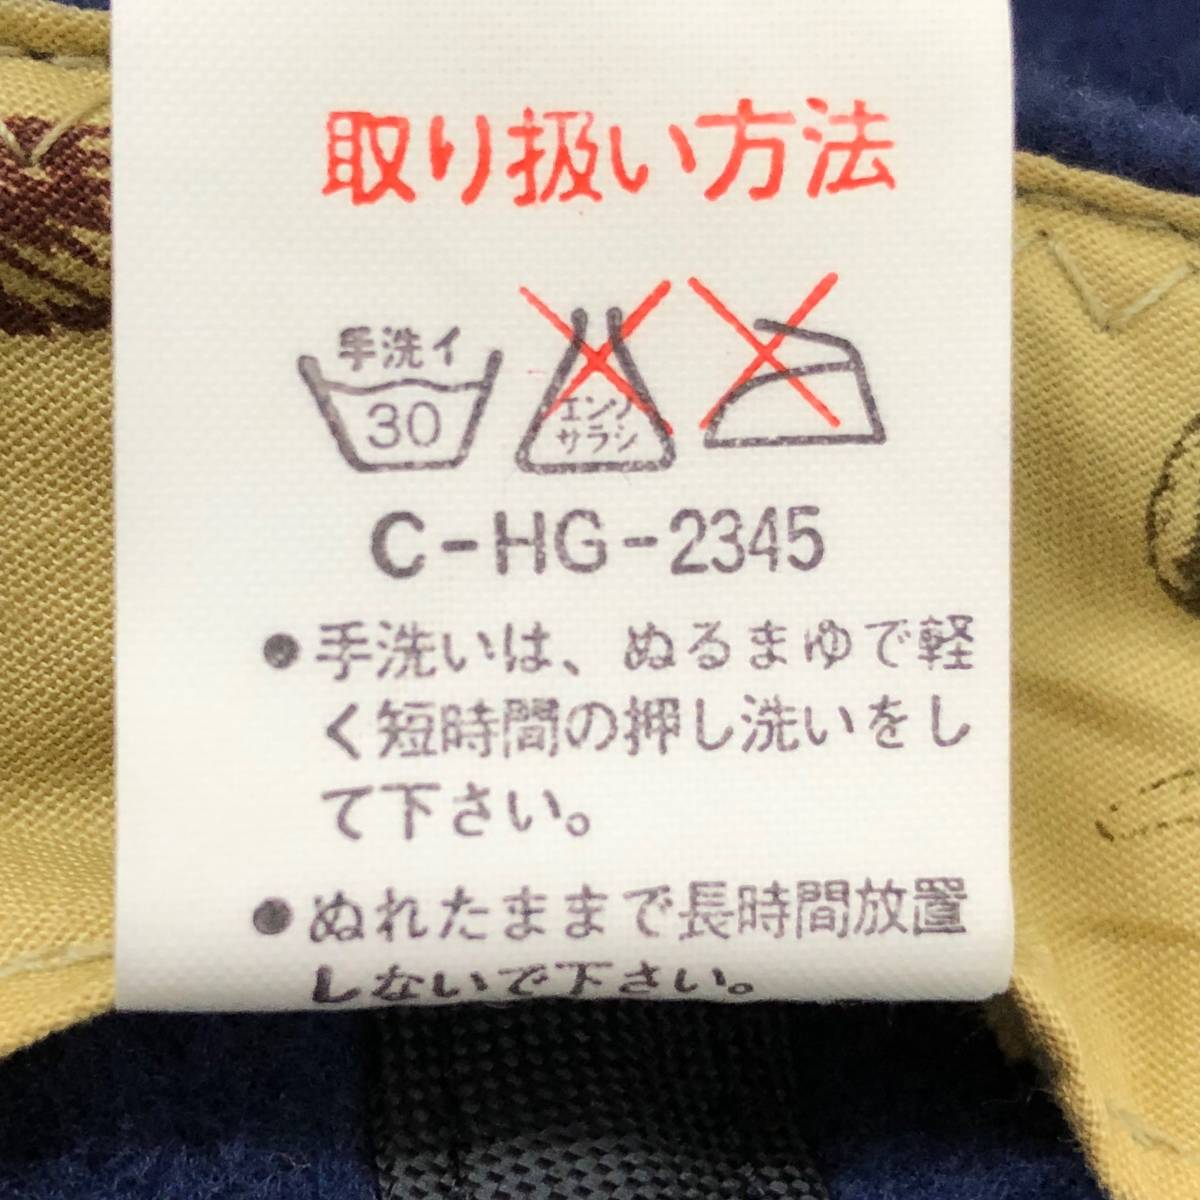 TARAS BOULBA タラスブルバ 帽子 キャップ フリースカントリーキャップ ネイビー 青系 L メンズ アシックス asics UFH350 日本製 未使用_画像8